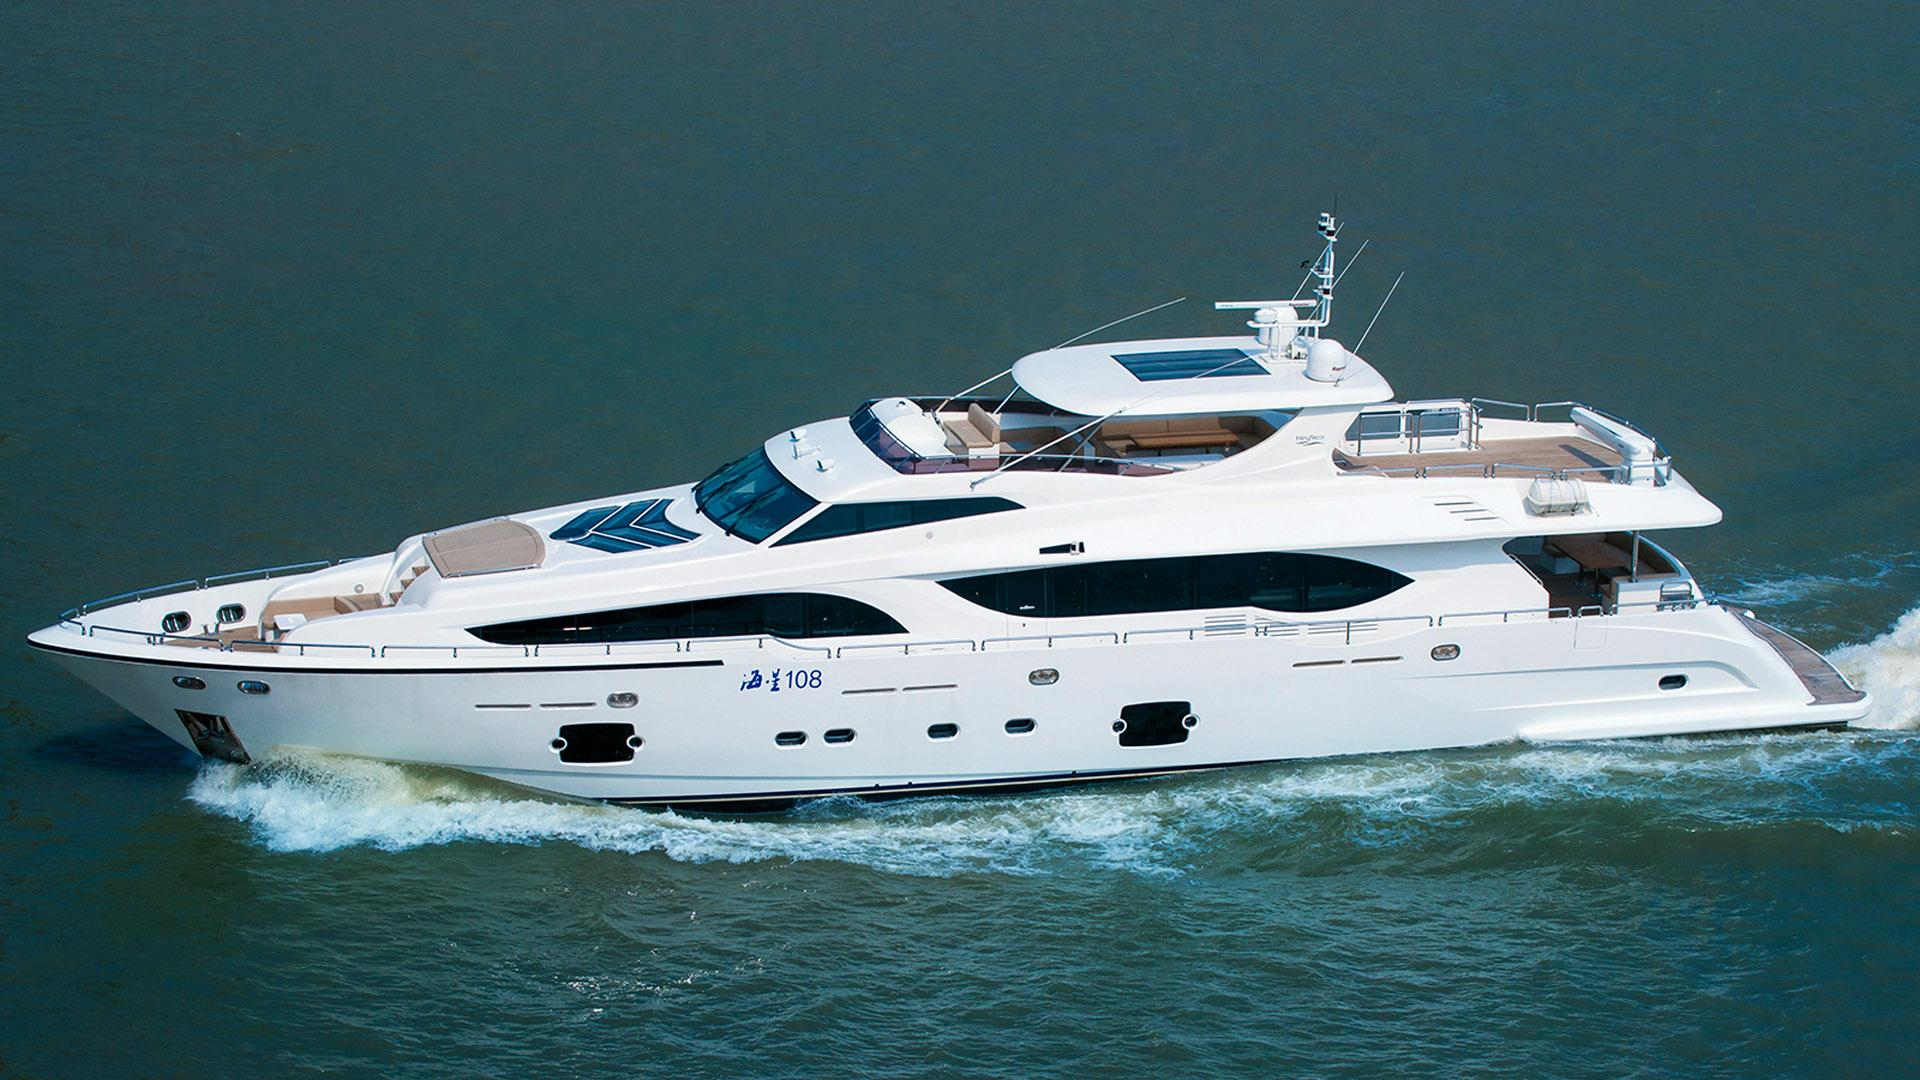 contessa motoryacht heysea 2013 33m profile